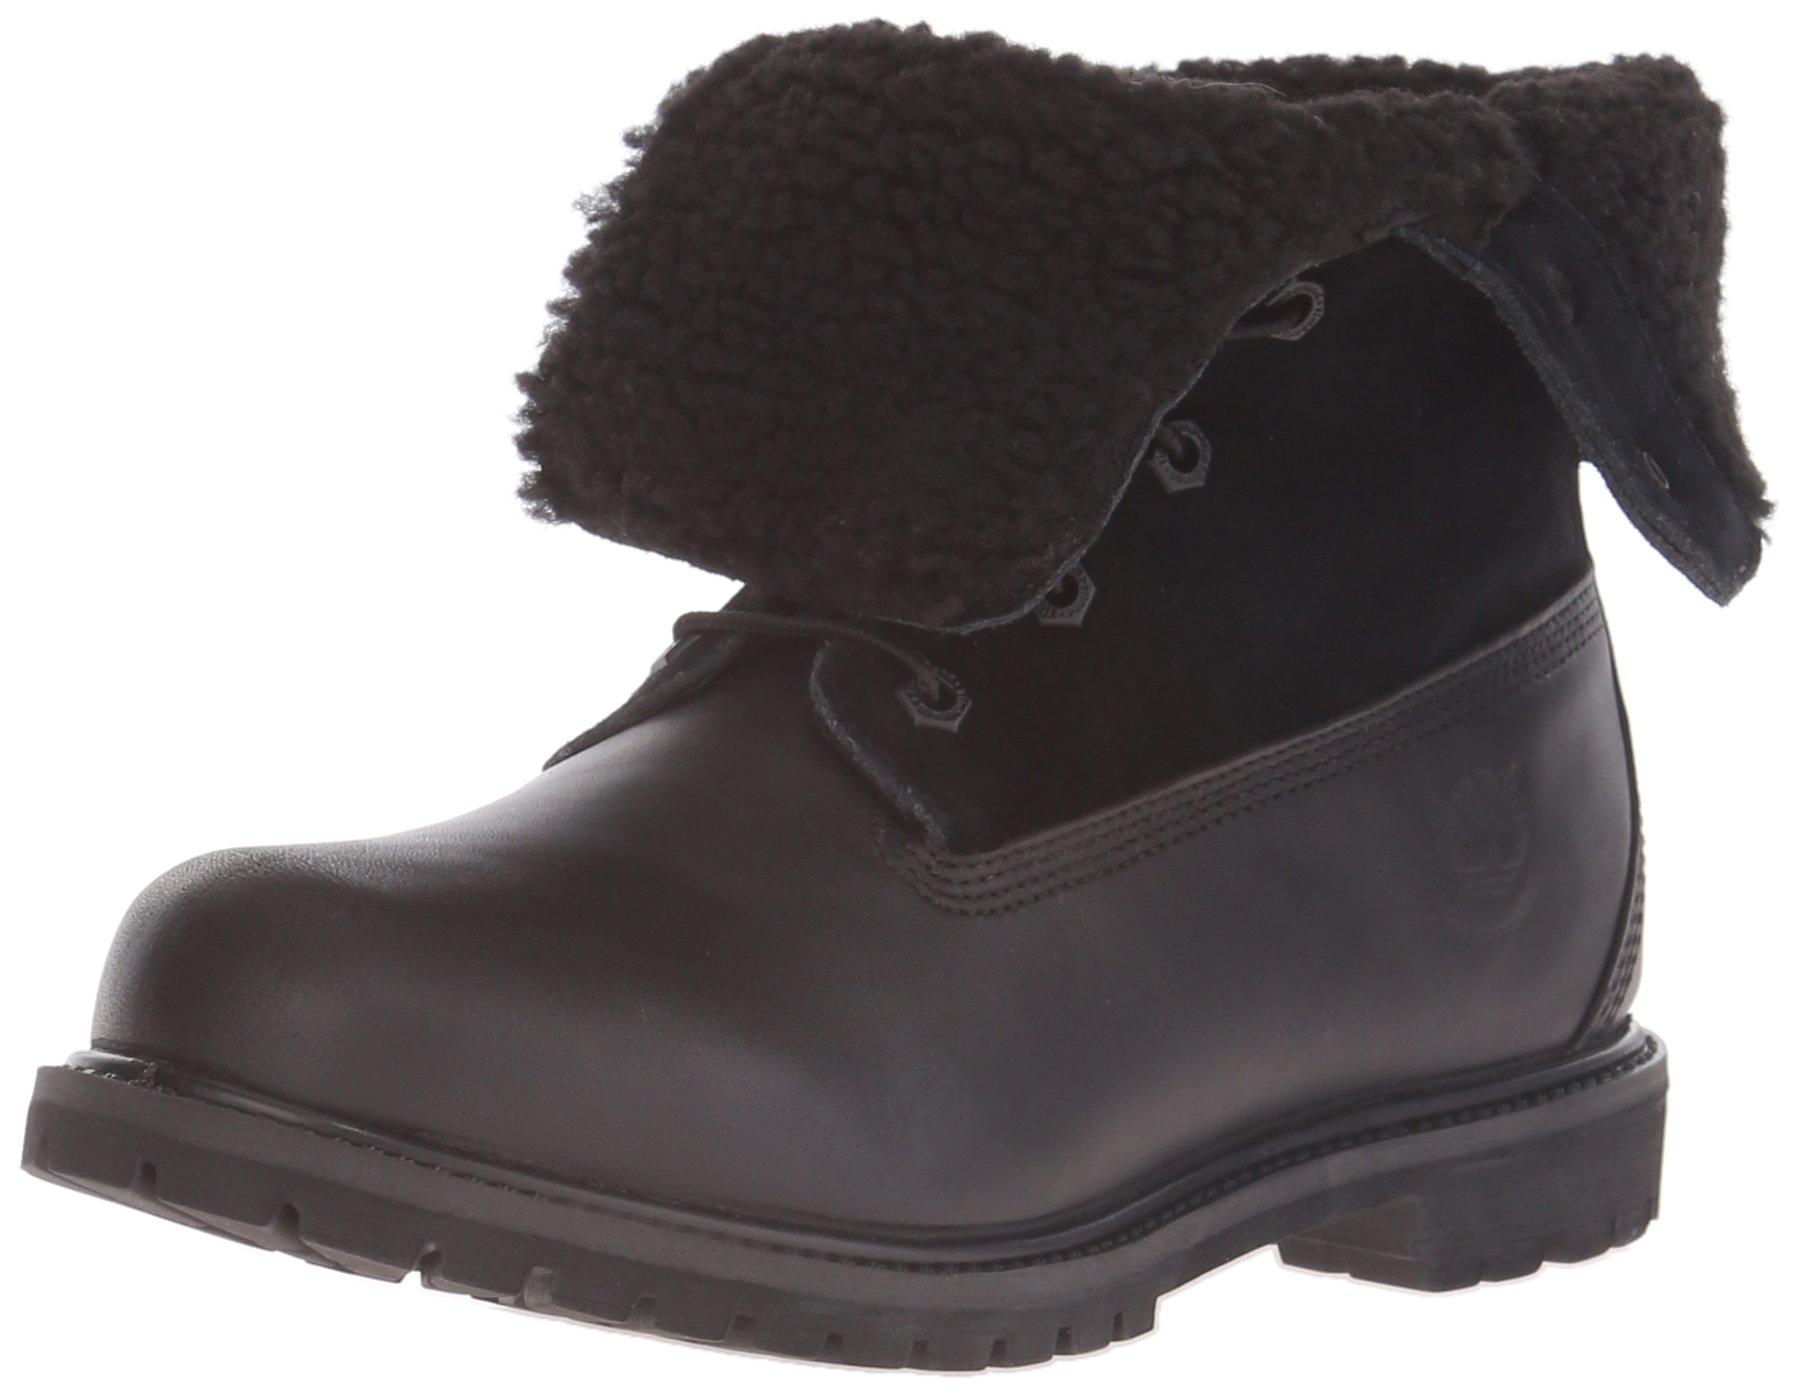 Timberland Women's EK Authentics Teddy Fleece WP Snow Boot,Black/Black,8 M US